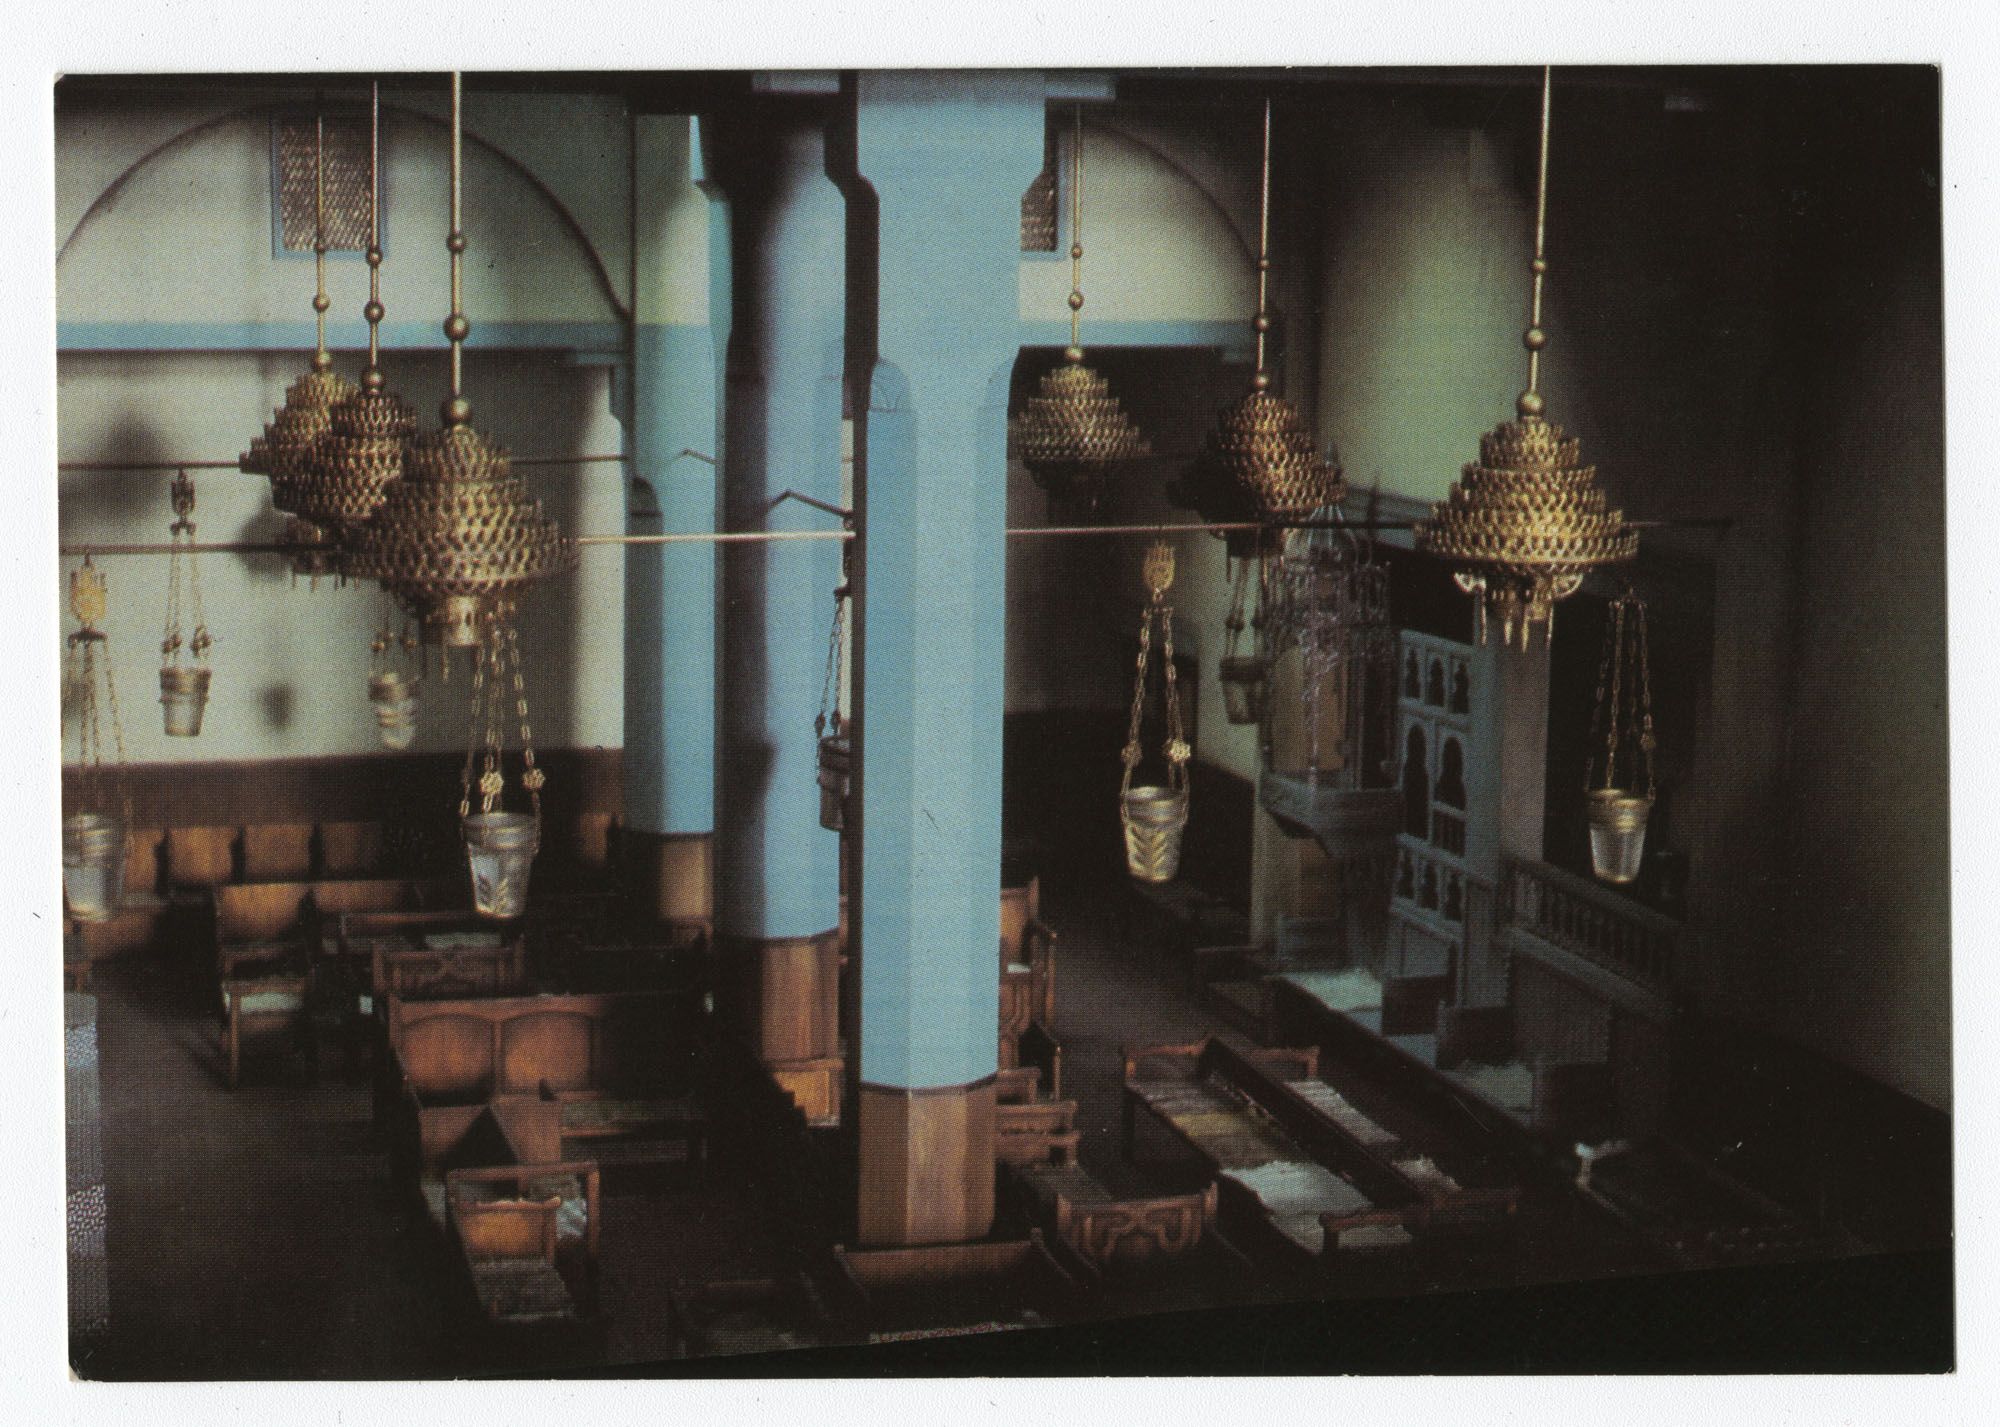 Interior of Danan Synagogue in Fez, Morocco. Mid-17th century. Model. / פנים בית הכנסת דנאן ספאס שבמרוקו. אמצע המאה ה-17. שיחזור